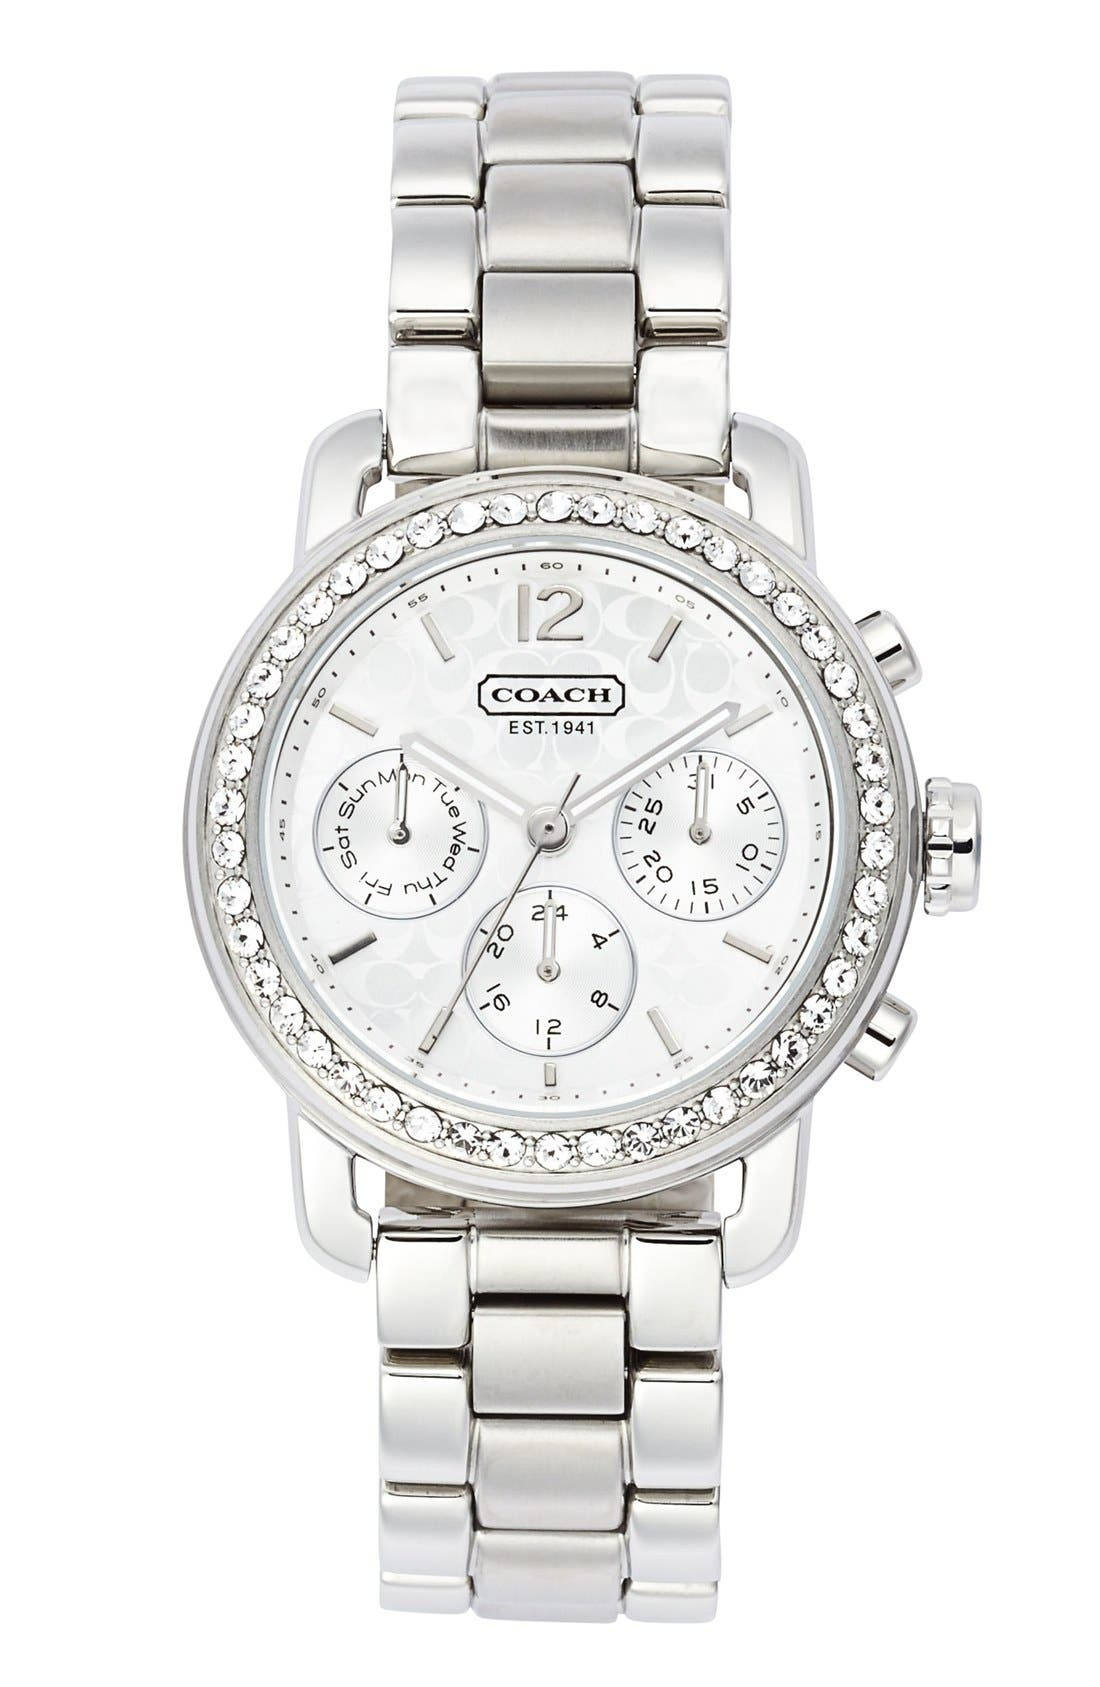 Main Image - COACH 'Legacy Sport' Crystal Bezel Bracelet Watch, 36mm